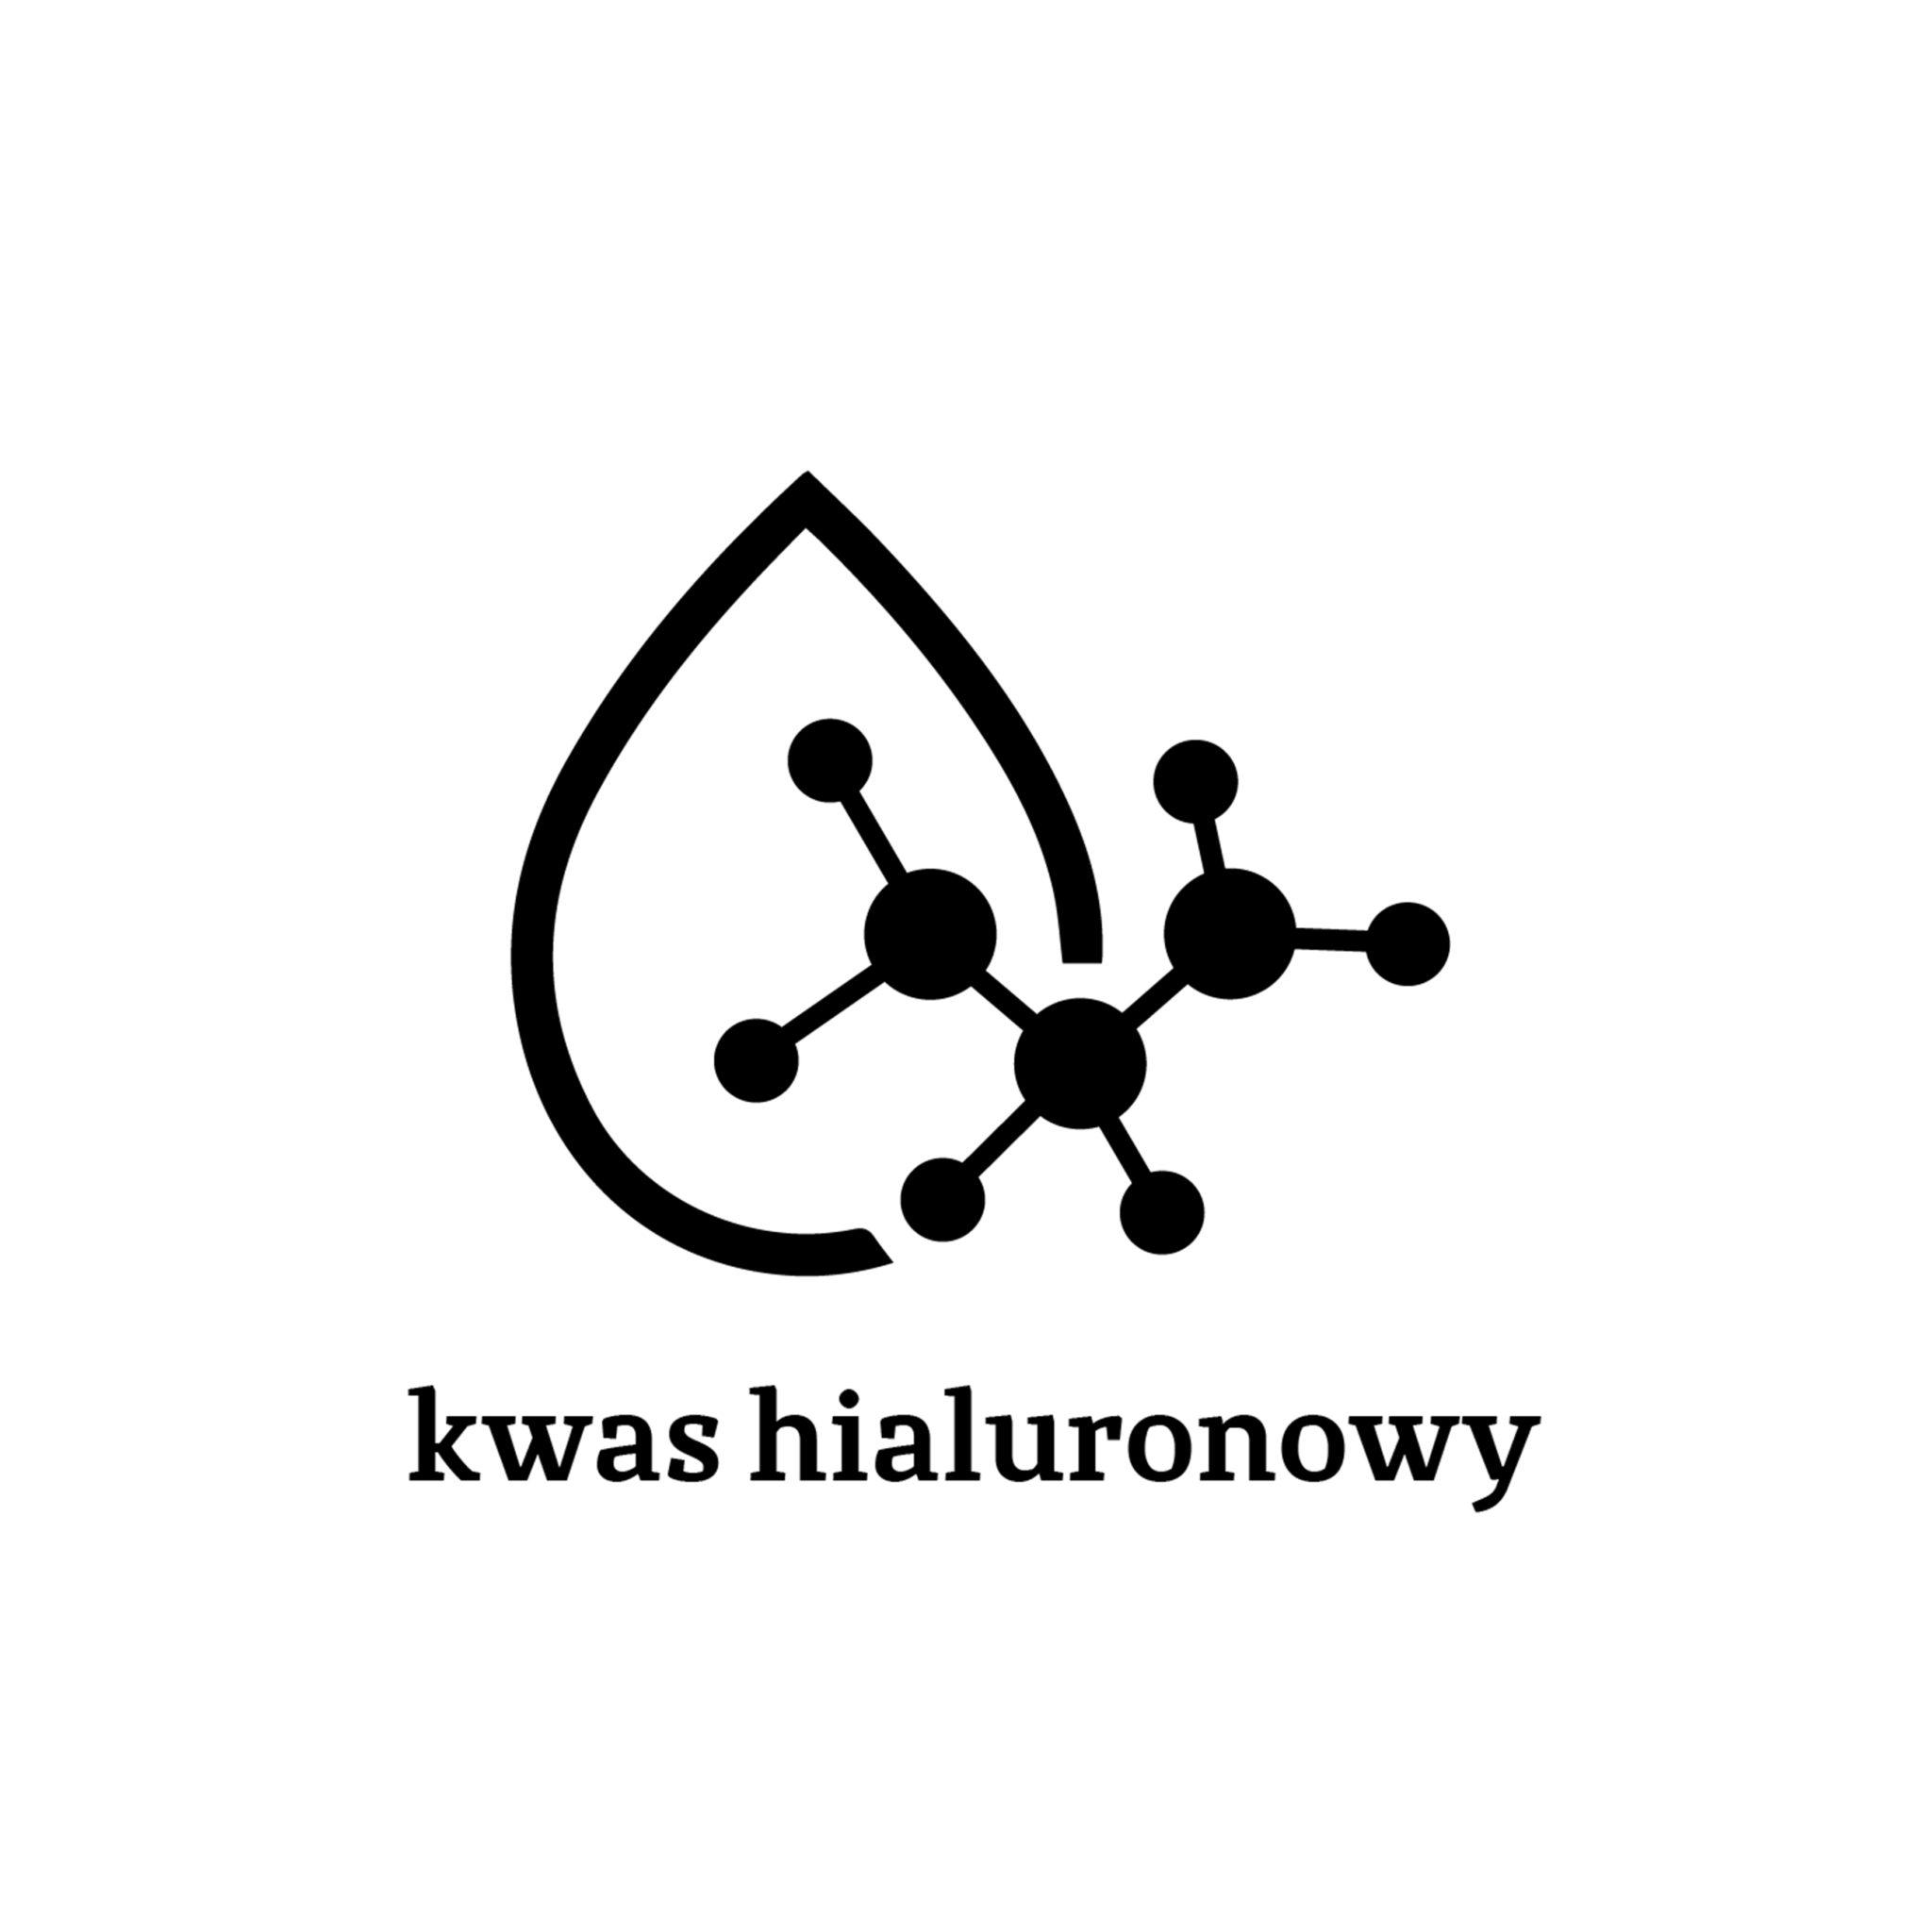 kwashialuronowy